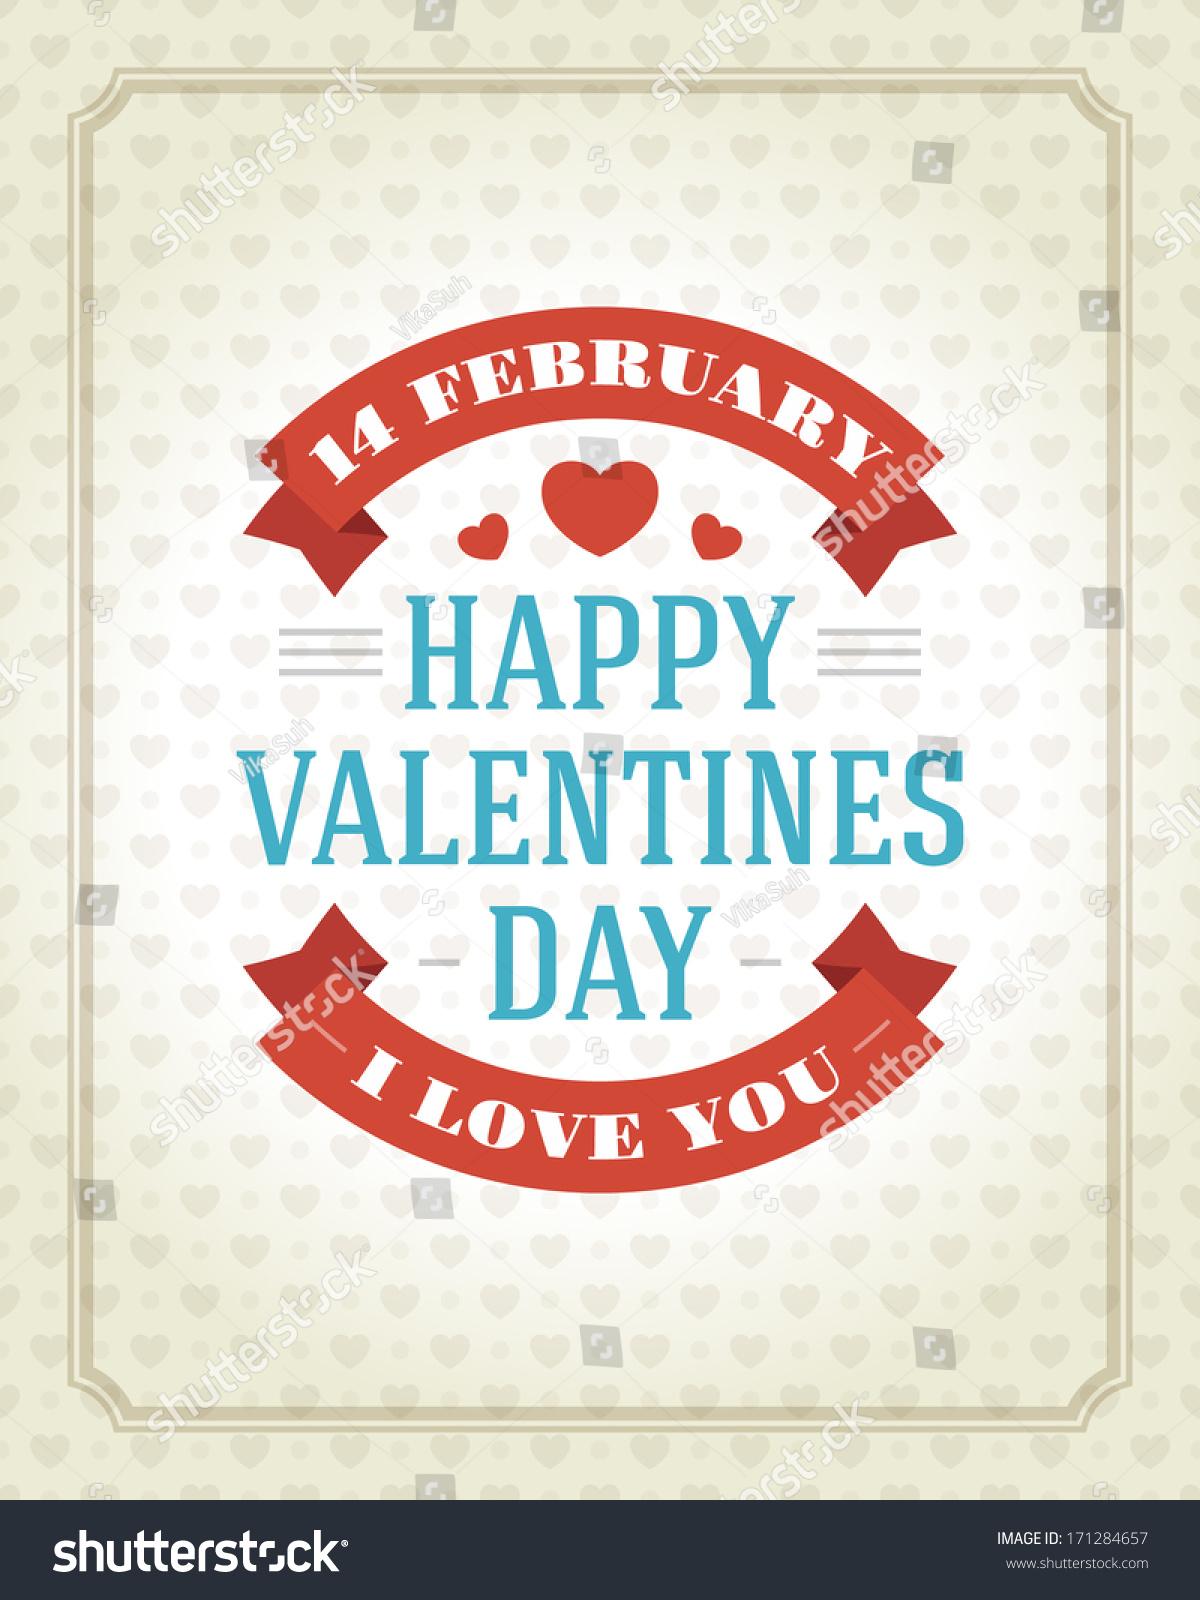 Happy Valentines Day Message Vintage Retro Stock Vector Royalty